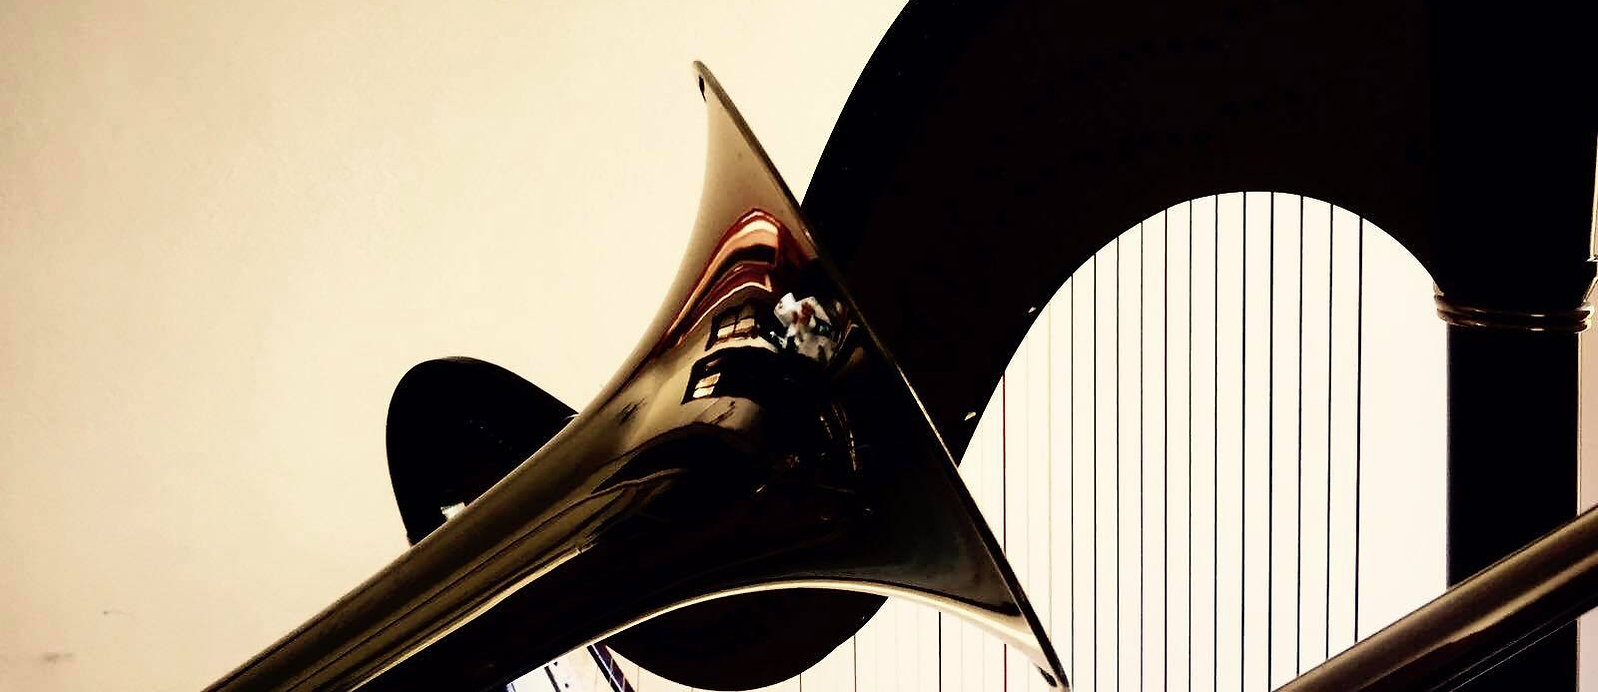 decarismoduo arpa e trombone